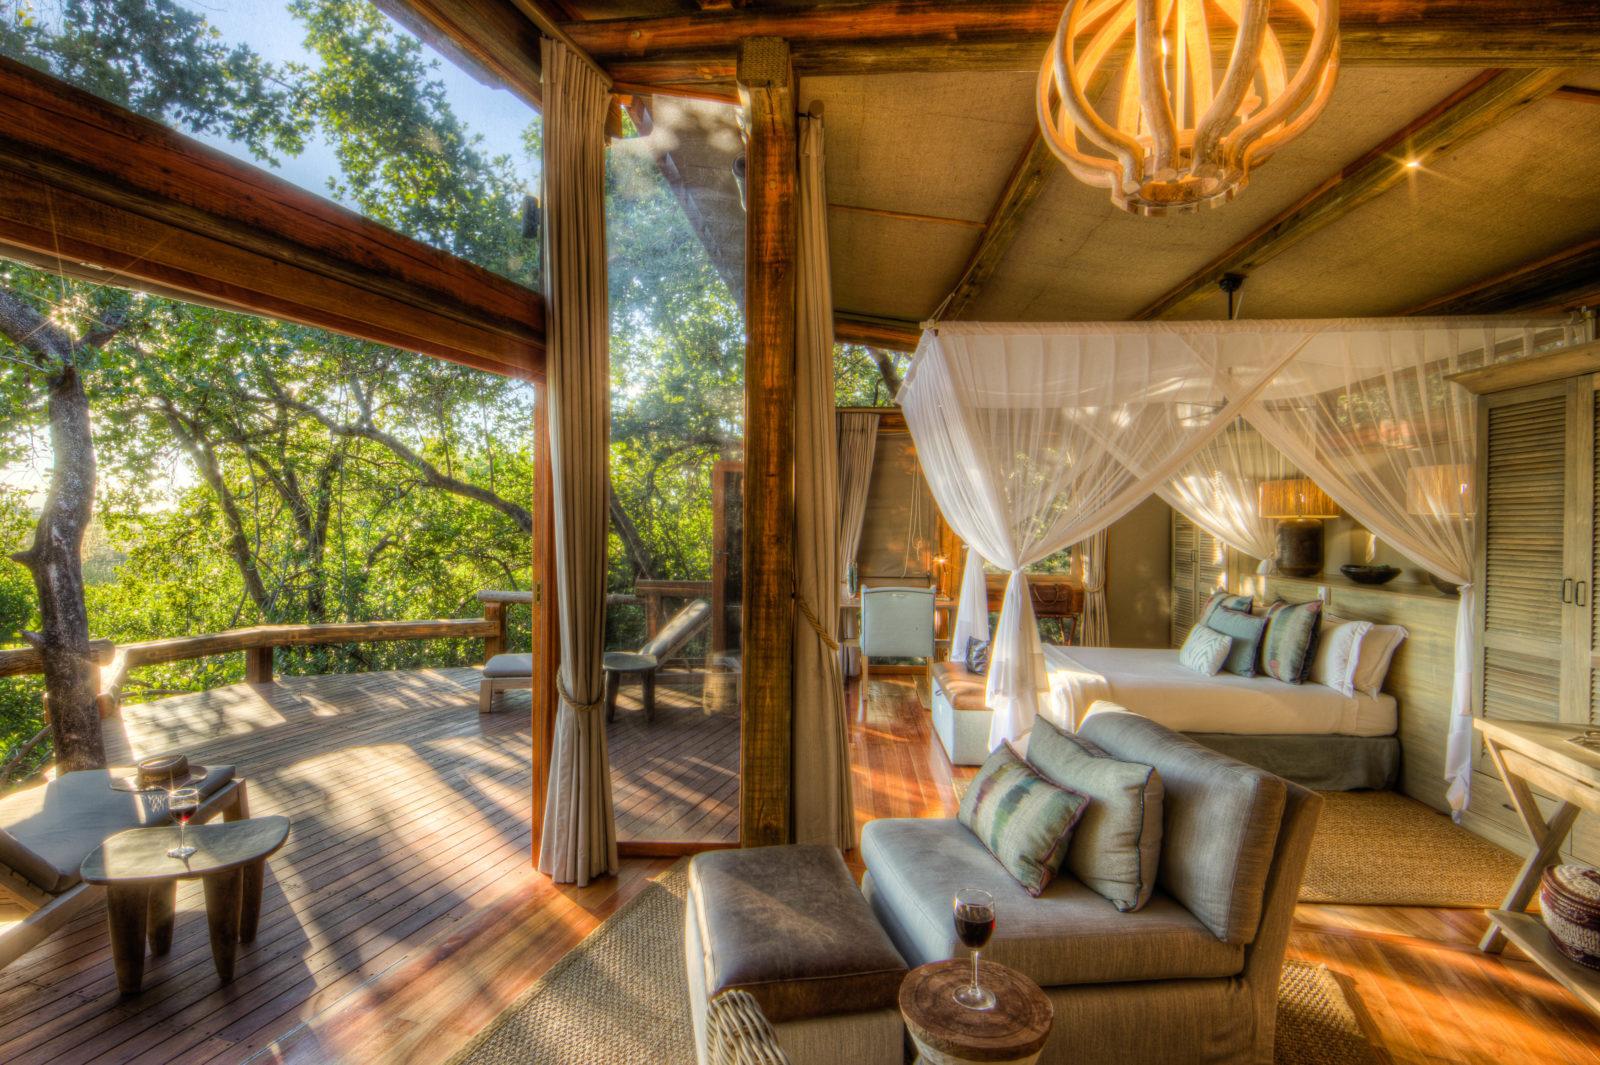 Interior bedroom and lounge space of Camp Okavango guest tent